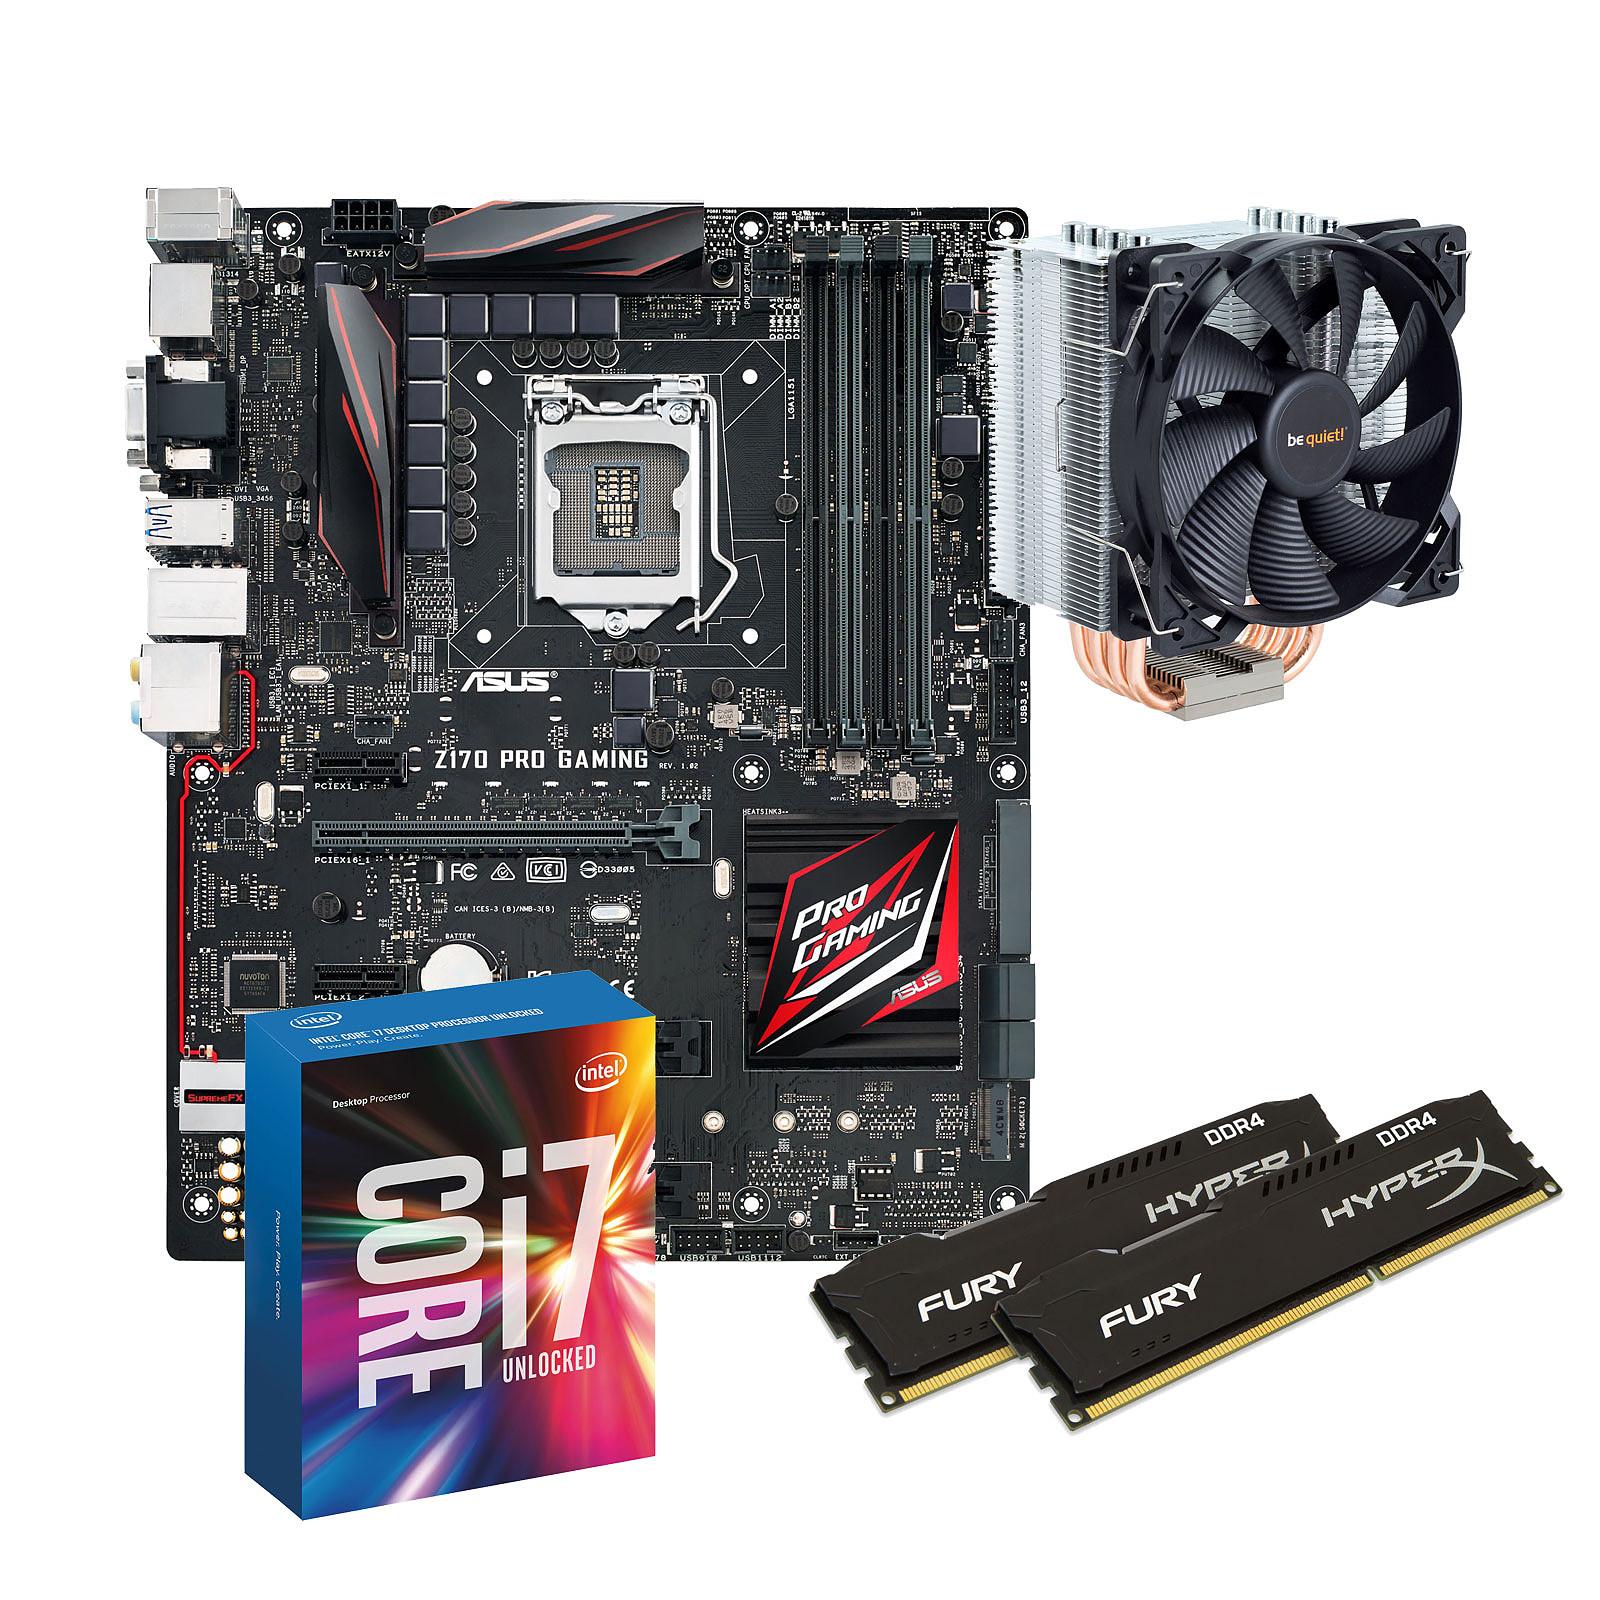 Kit Upgrade PC Core i7 ASUS Z170 PRO Gaming 8 Go